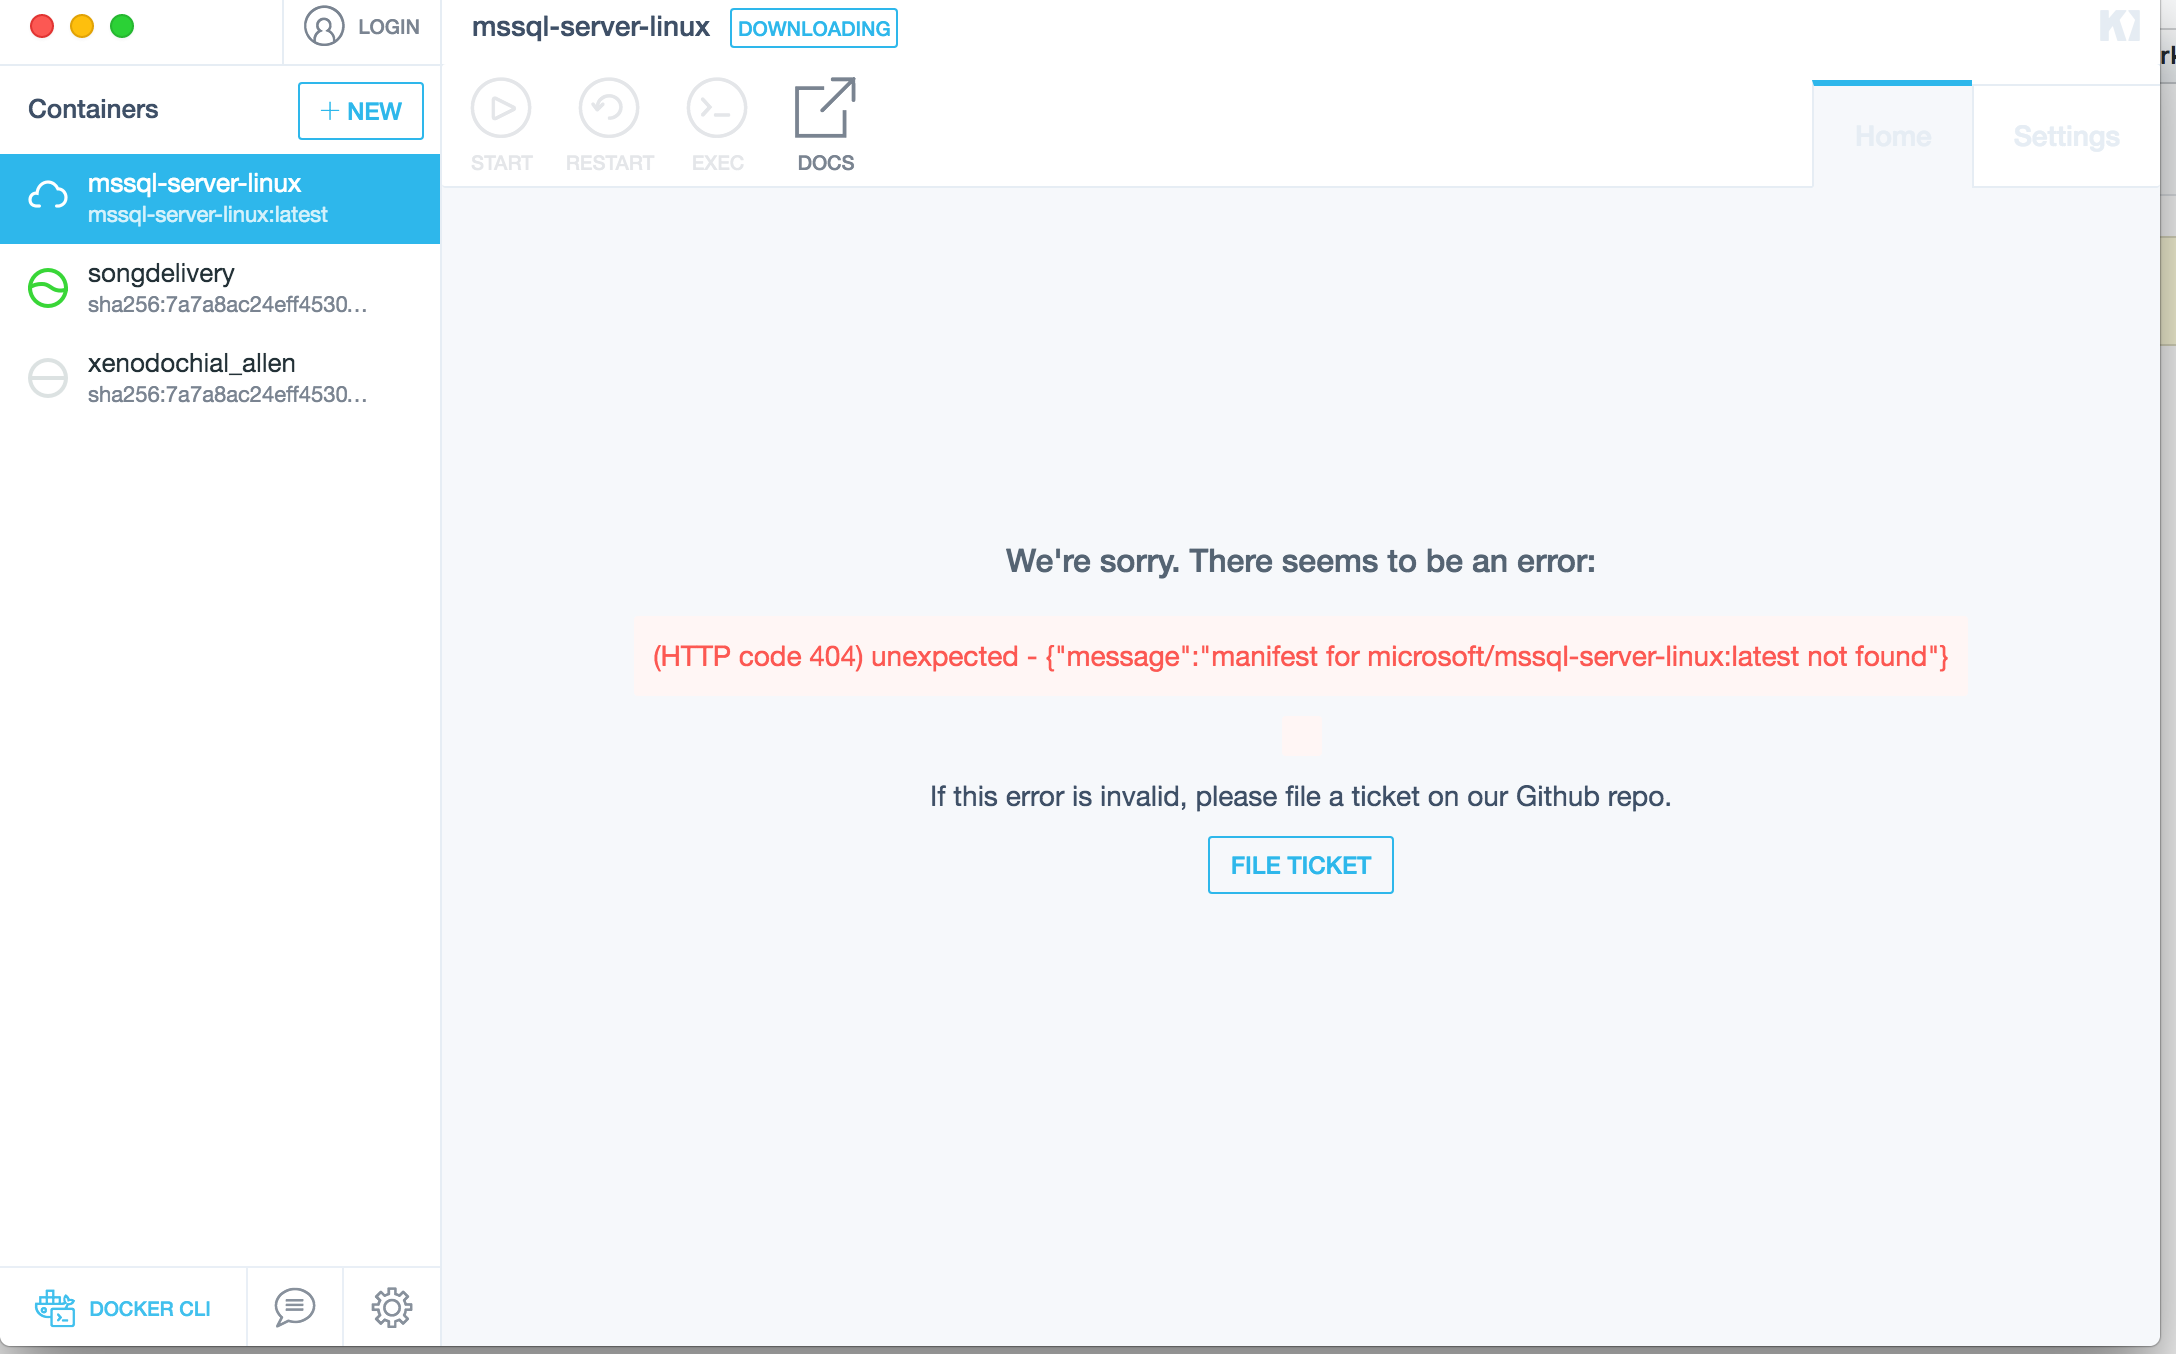 Missing manifest for microsoft/mssql-server-linux image · Issue